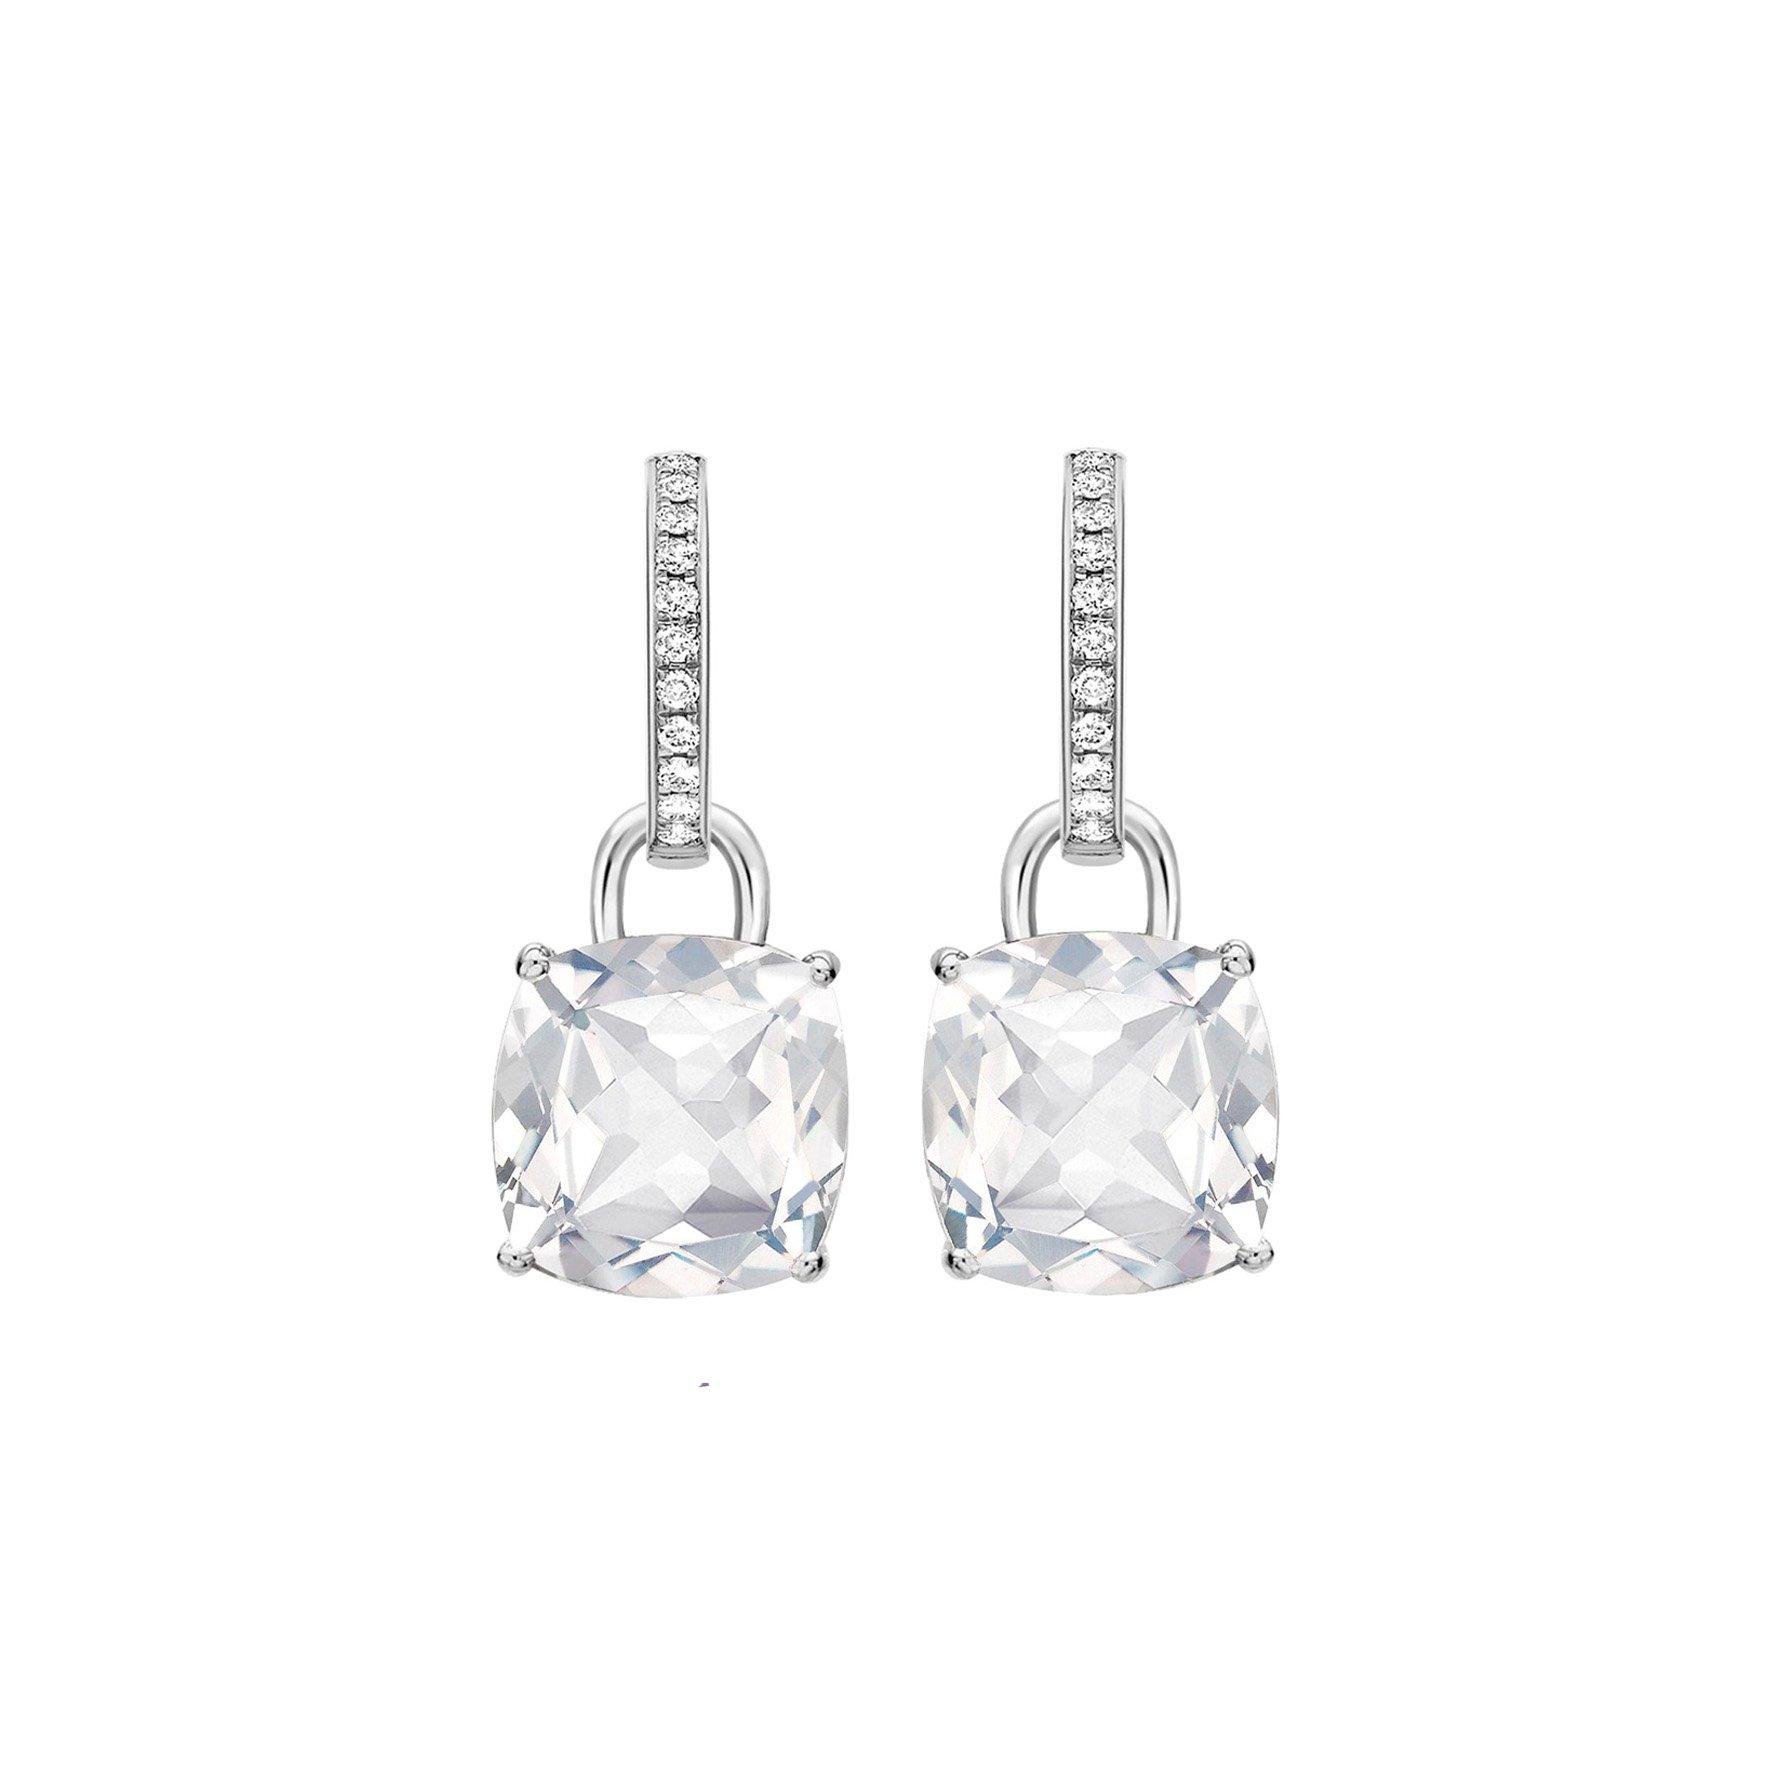 Kiki Classic White Topaz and Diamond Cushion Drop Earrings in White Gold - Kiki McDonough Jewellery - Sloane Square London | Kiki McDonough : Kiki McDonough Jewellery – Sloane Square London | Kiki McDonough